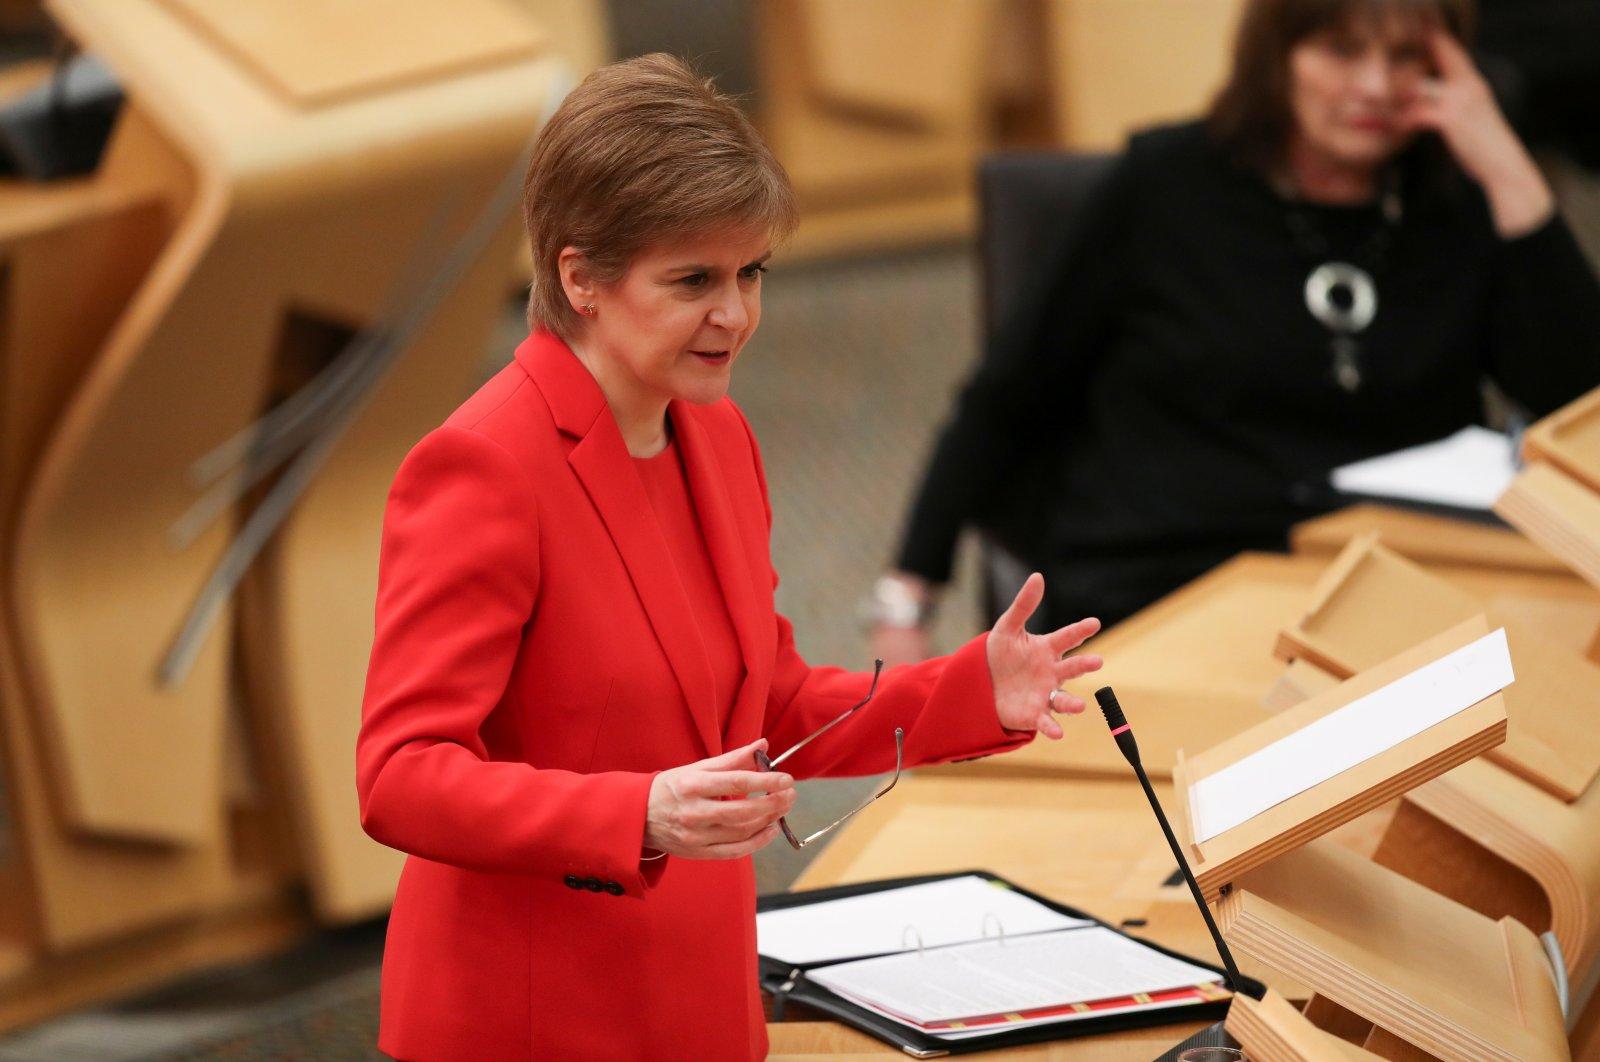 First Minister Nicola Sturgeon speaking at the Scottish Parliament in Edinburgh, Scotland, Britain, Jan. 19, 2021. (Reuters Photo)